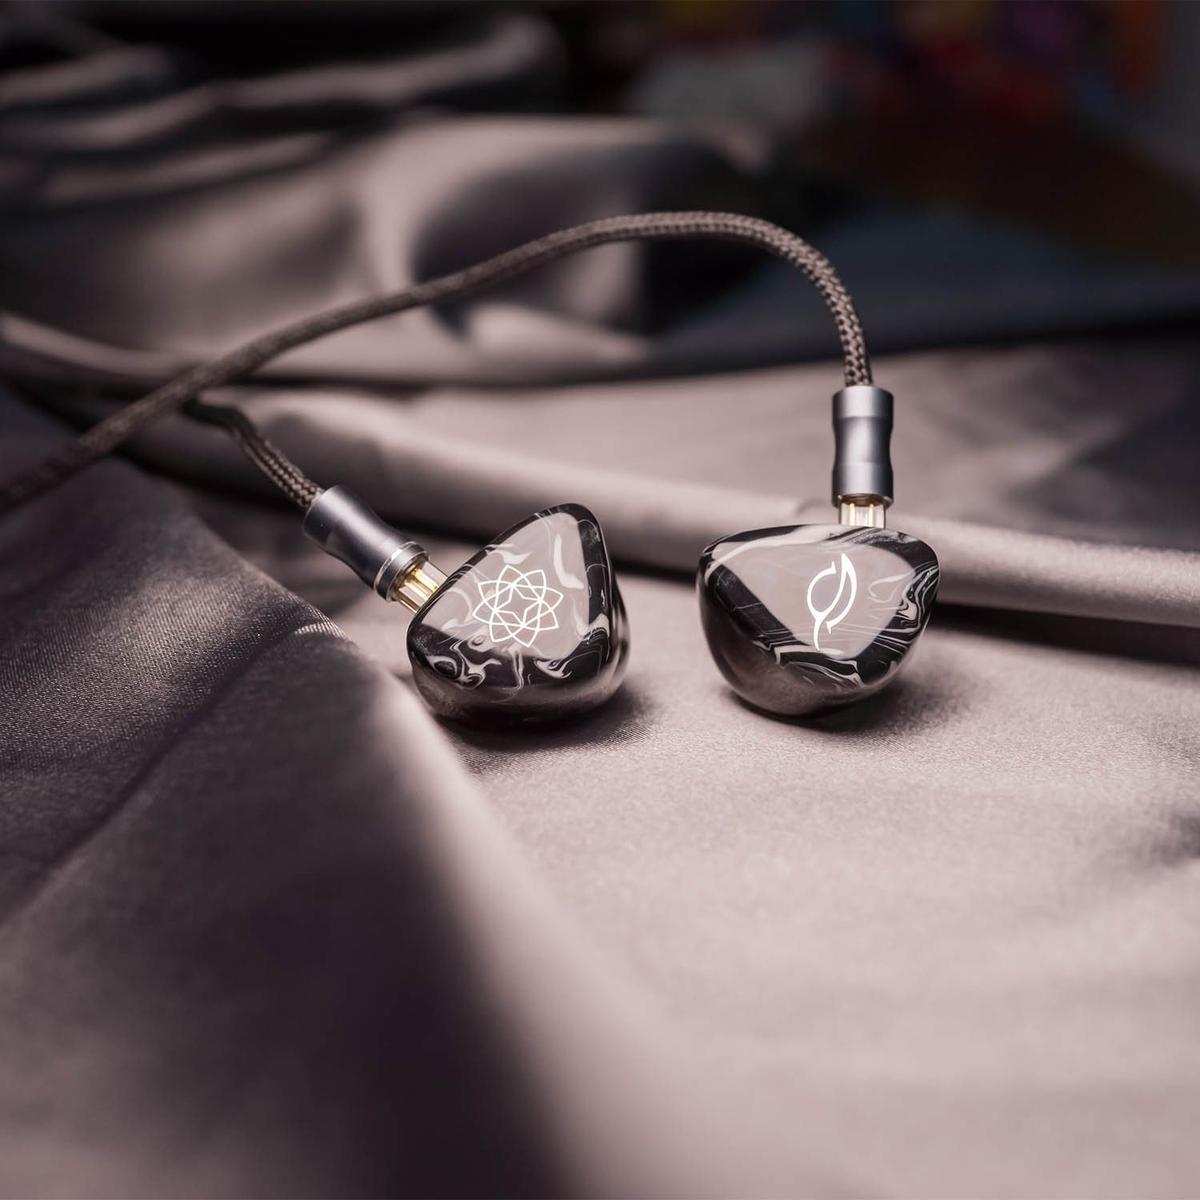 See Audio Bravery